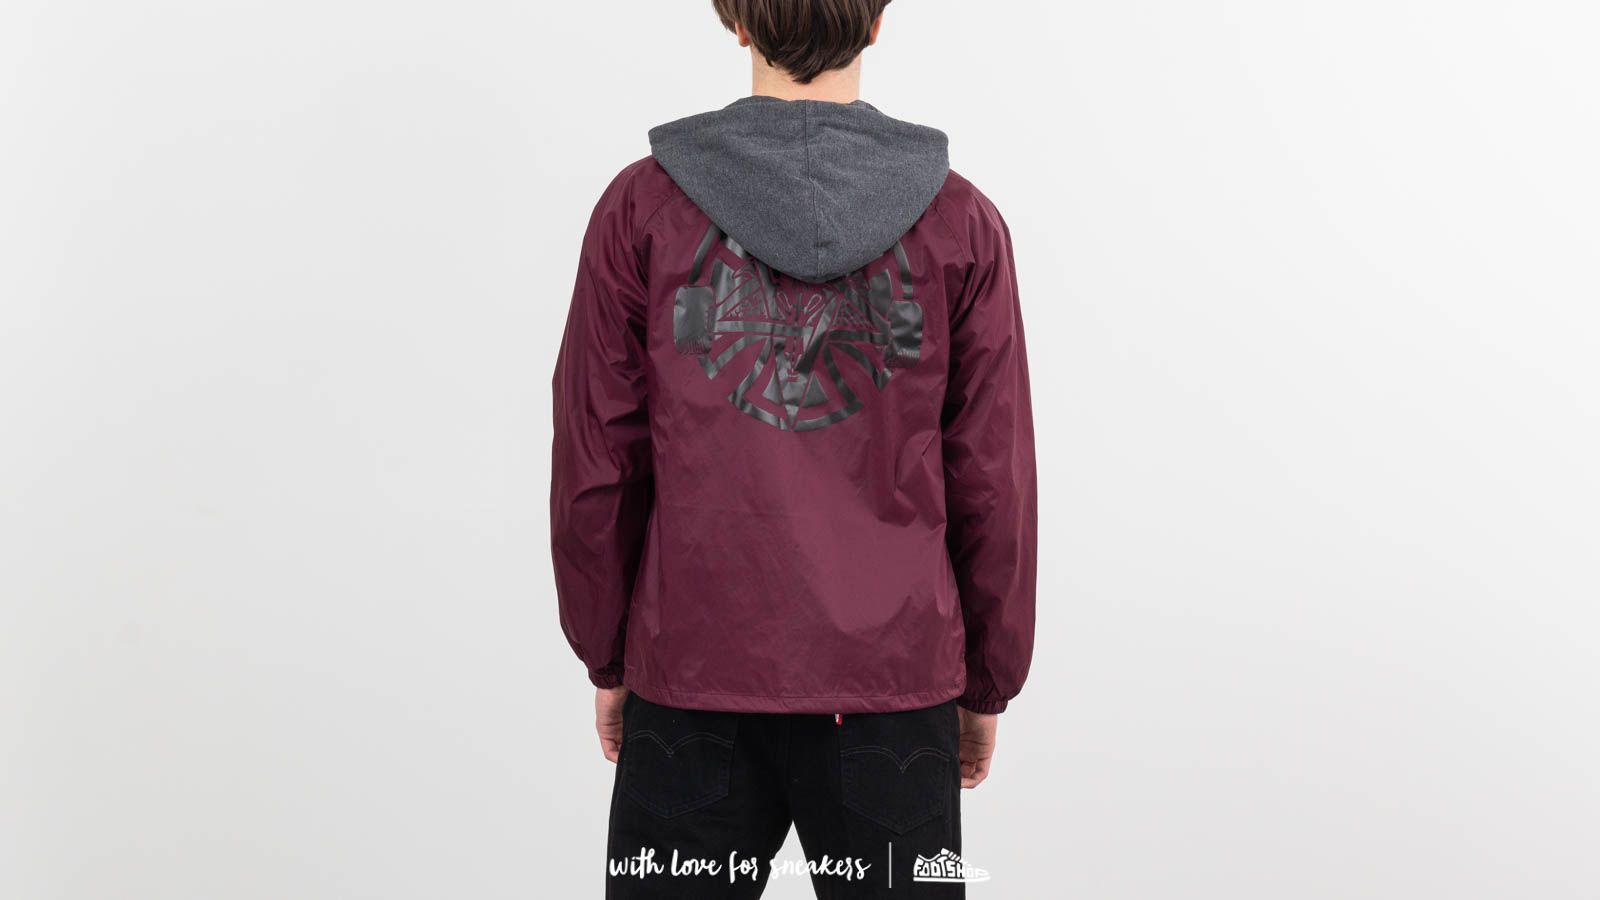 Dzsekik Independent x Thrasher Pentagram Cross Hooded